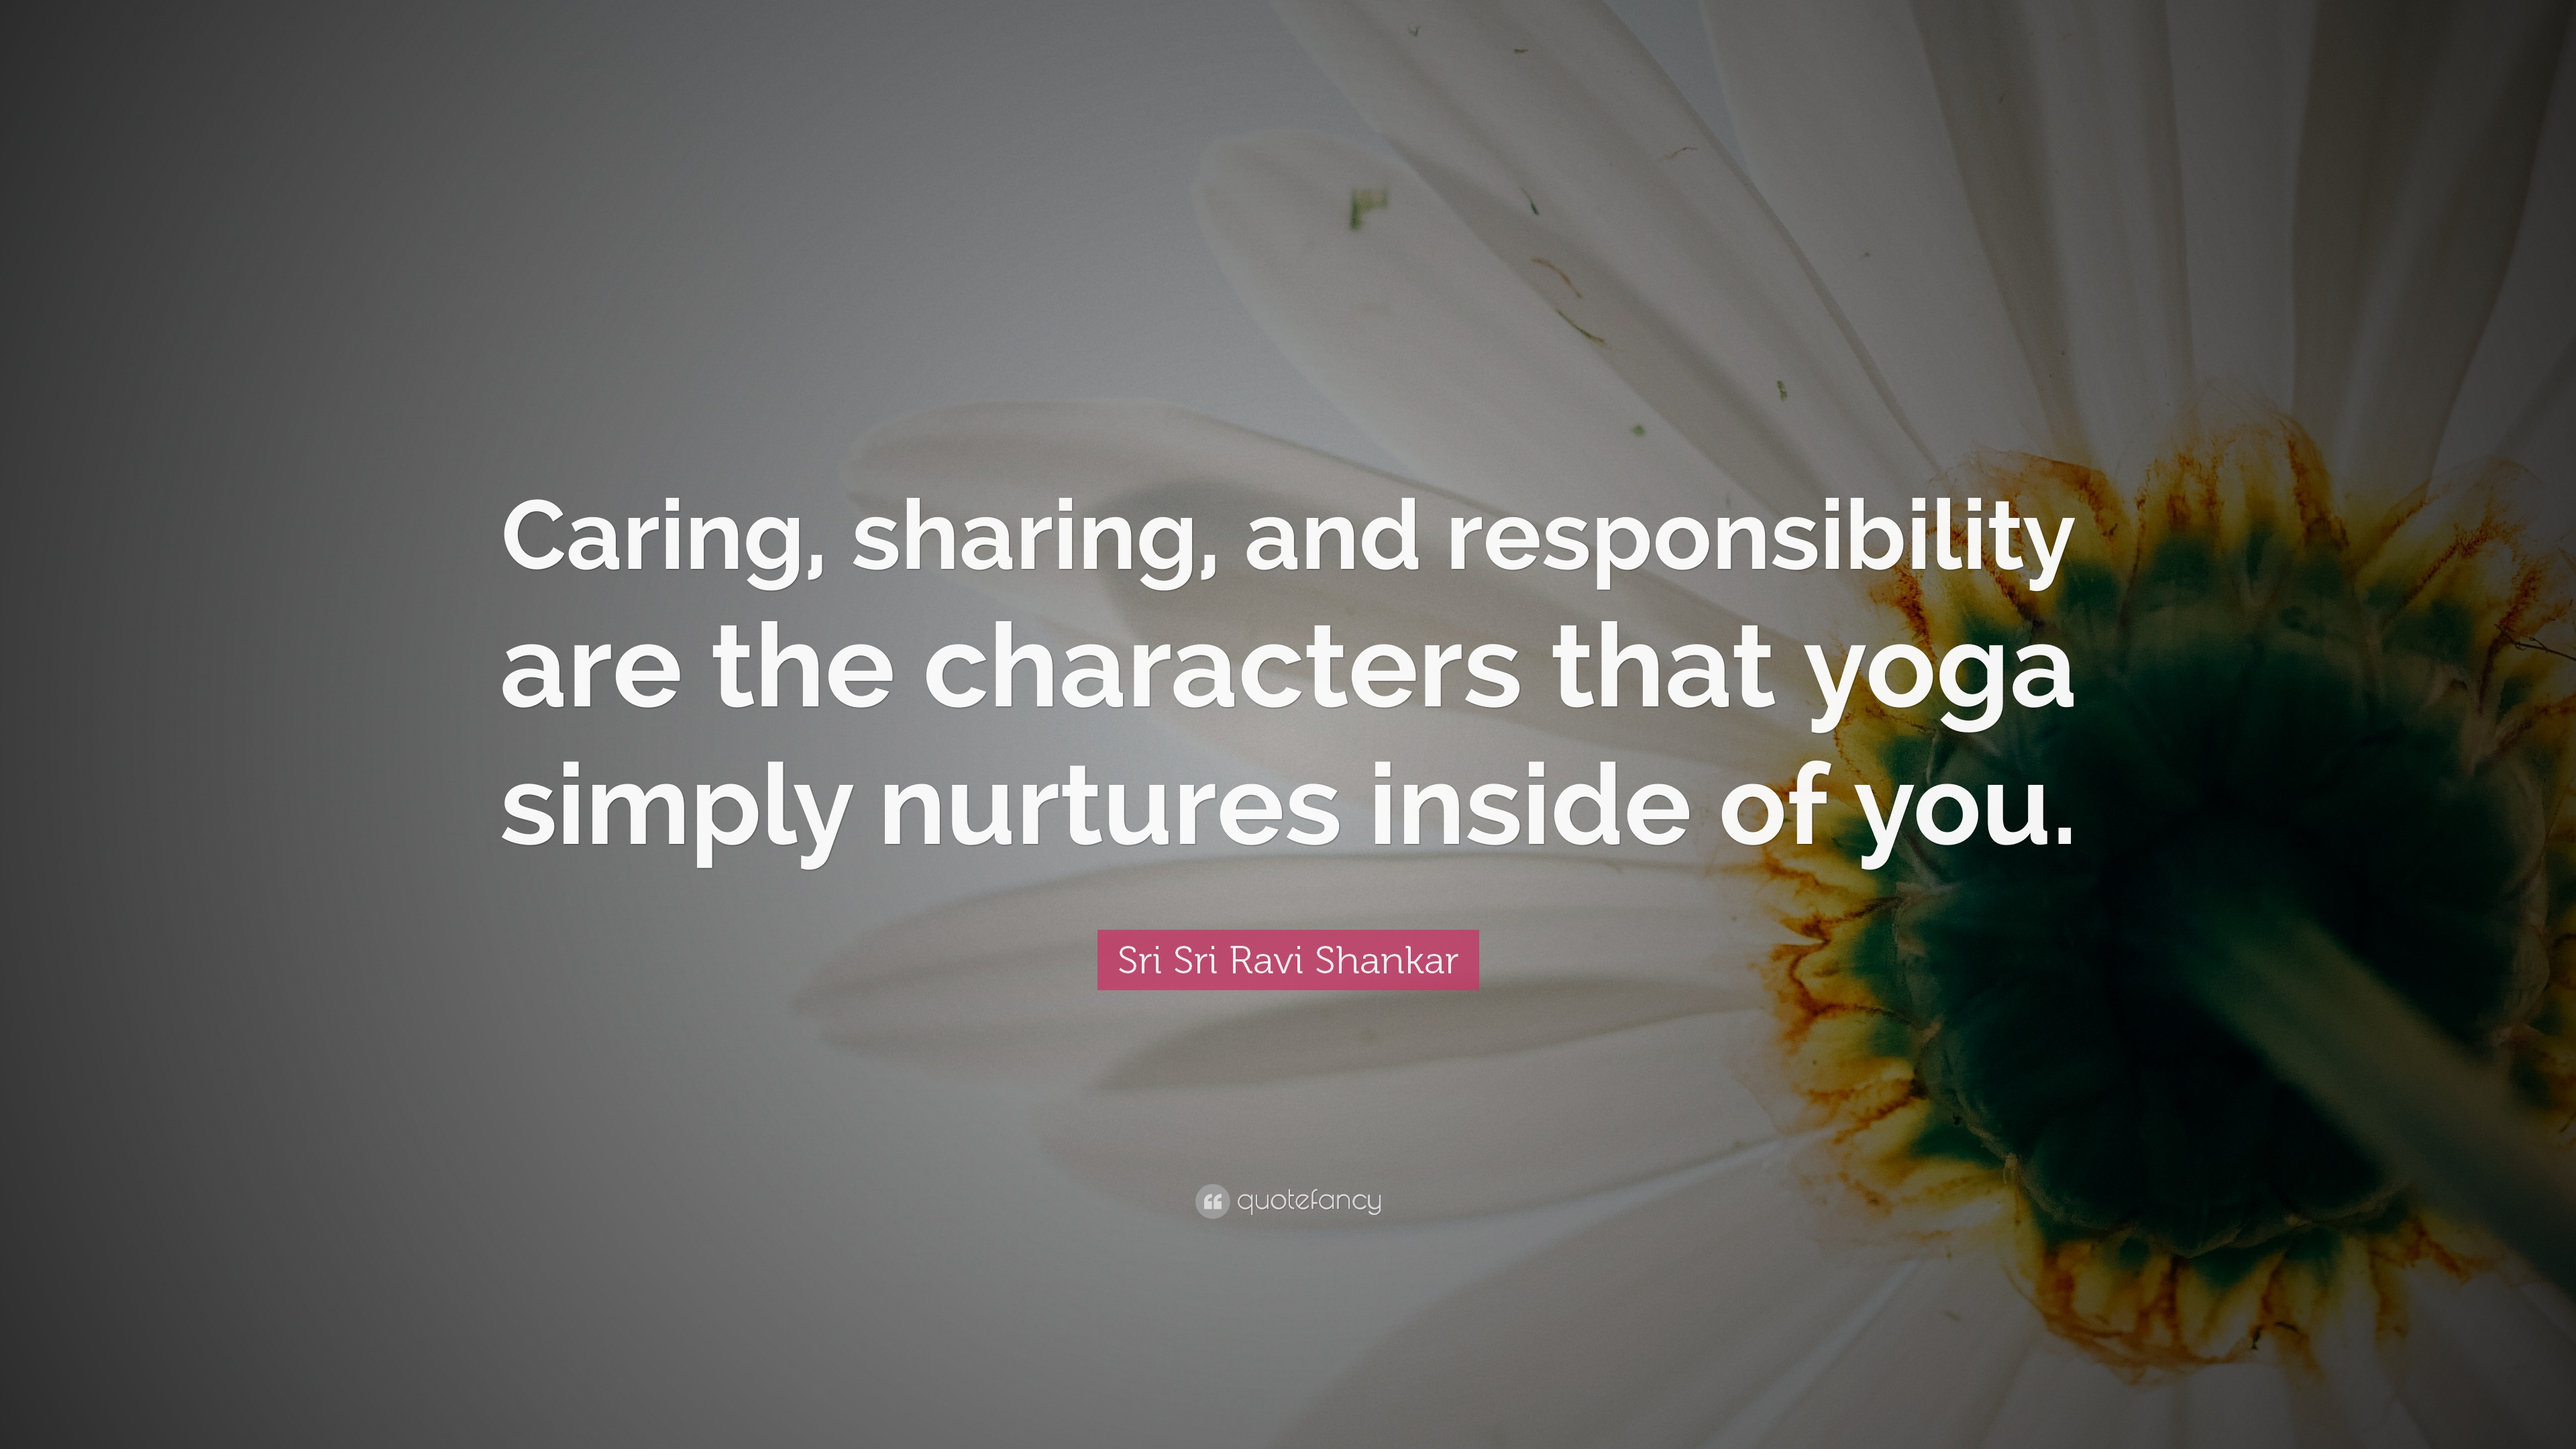 Sri Sri Ravi Shankar Quote Caring Sharing And Responsibility Are